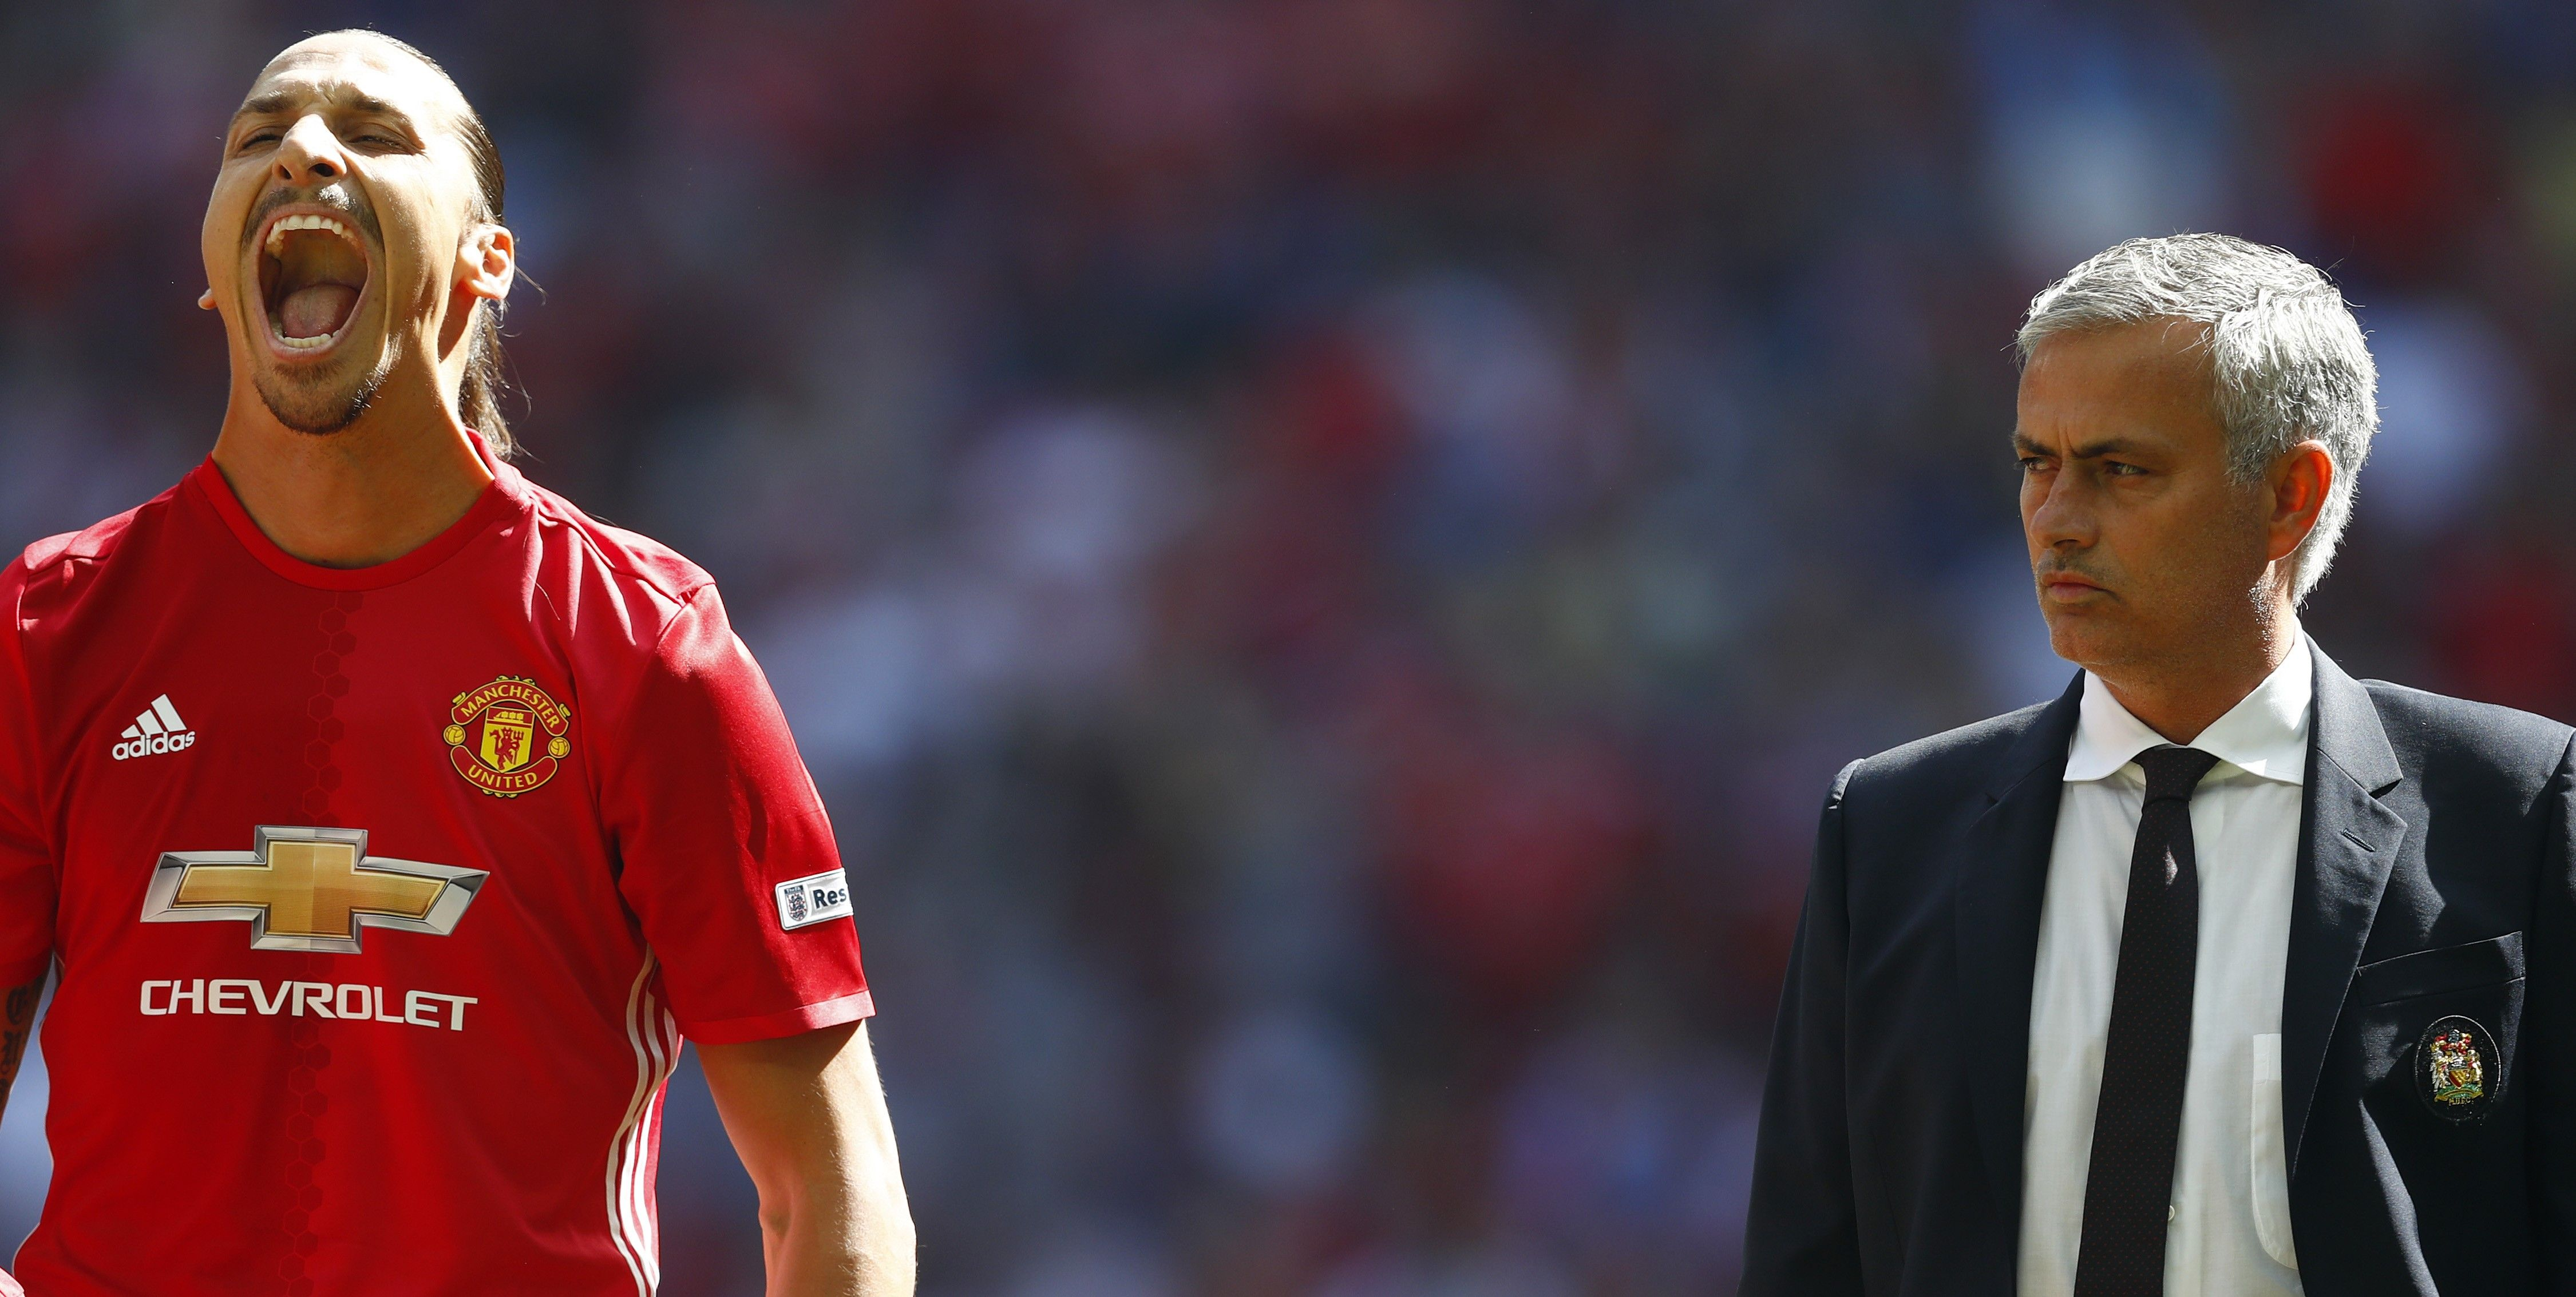 La palette de Charaf #3 : Manchester United 2/2